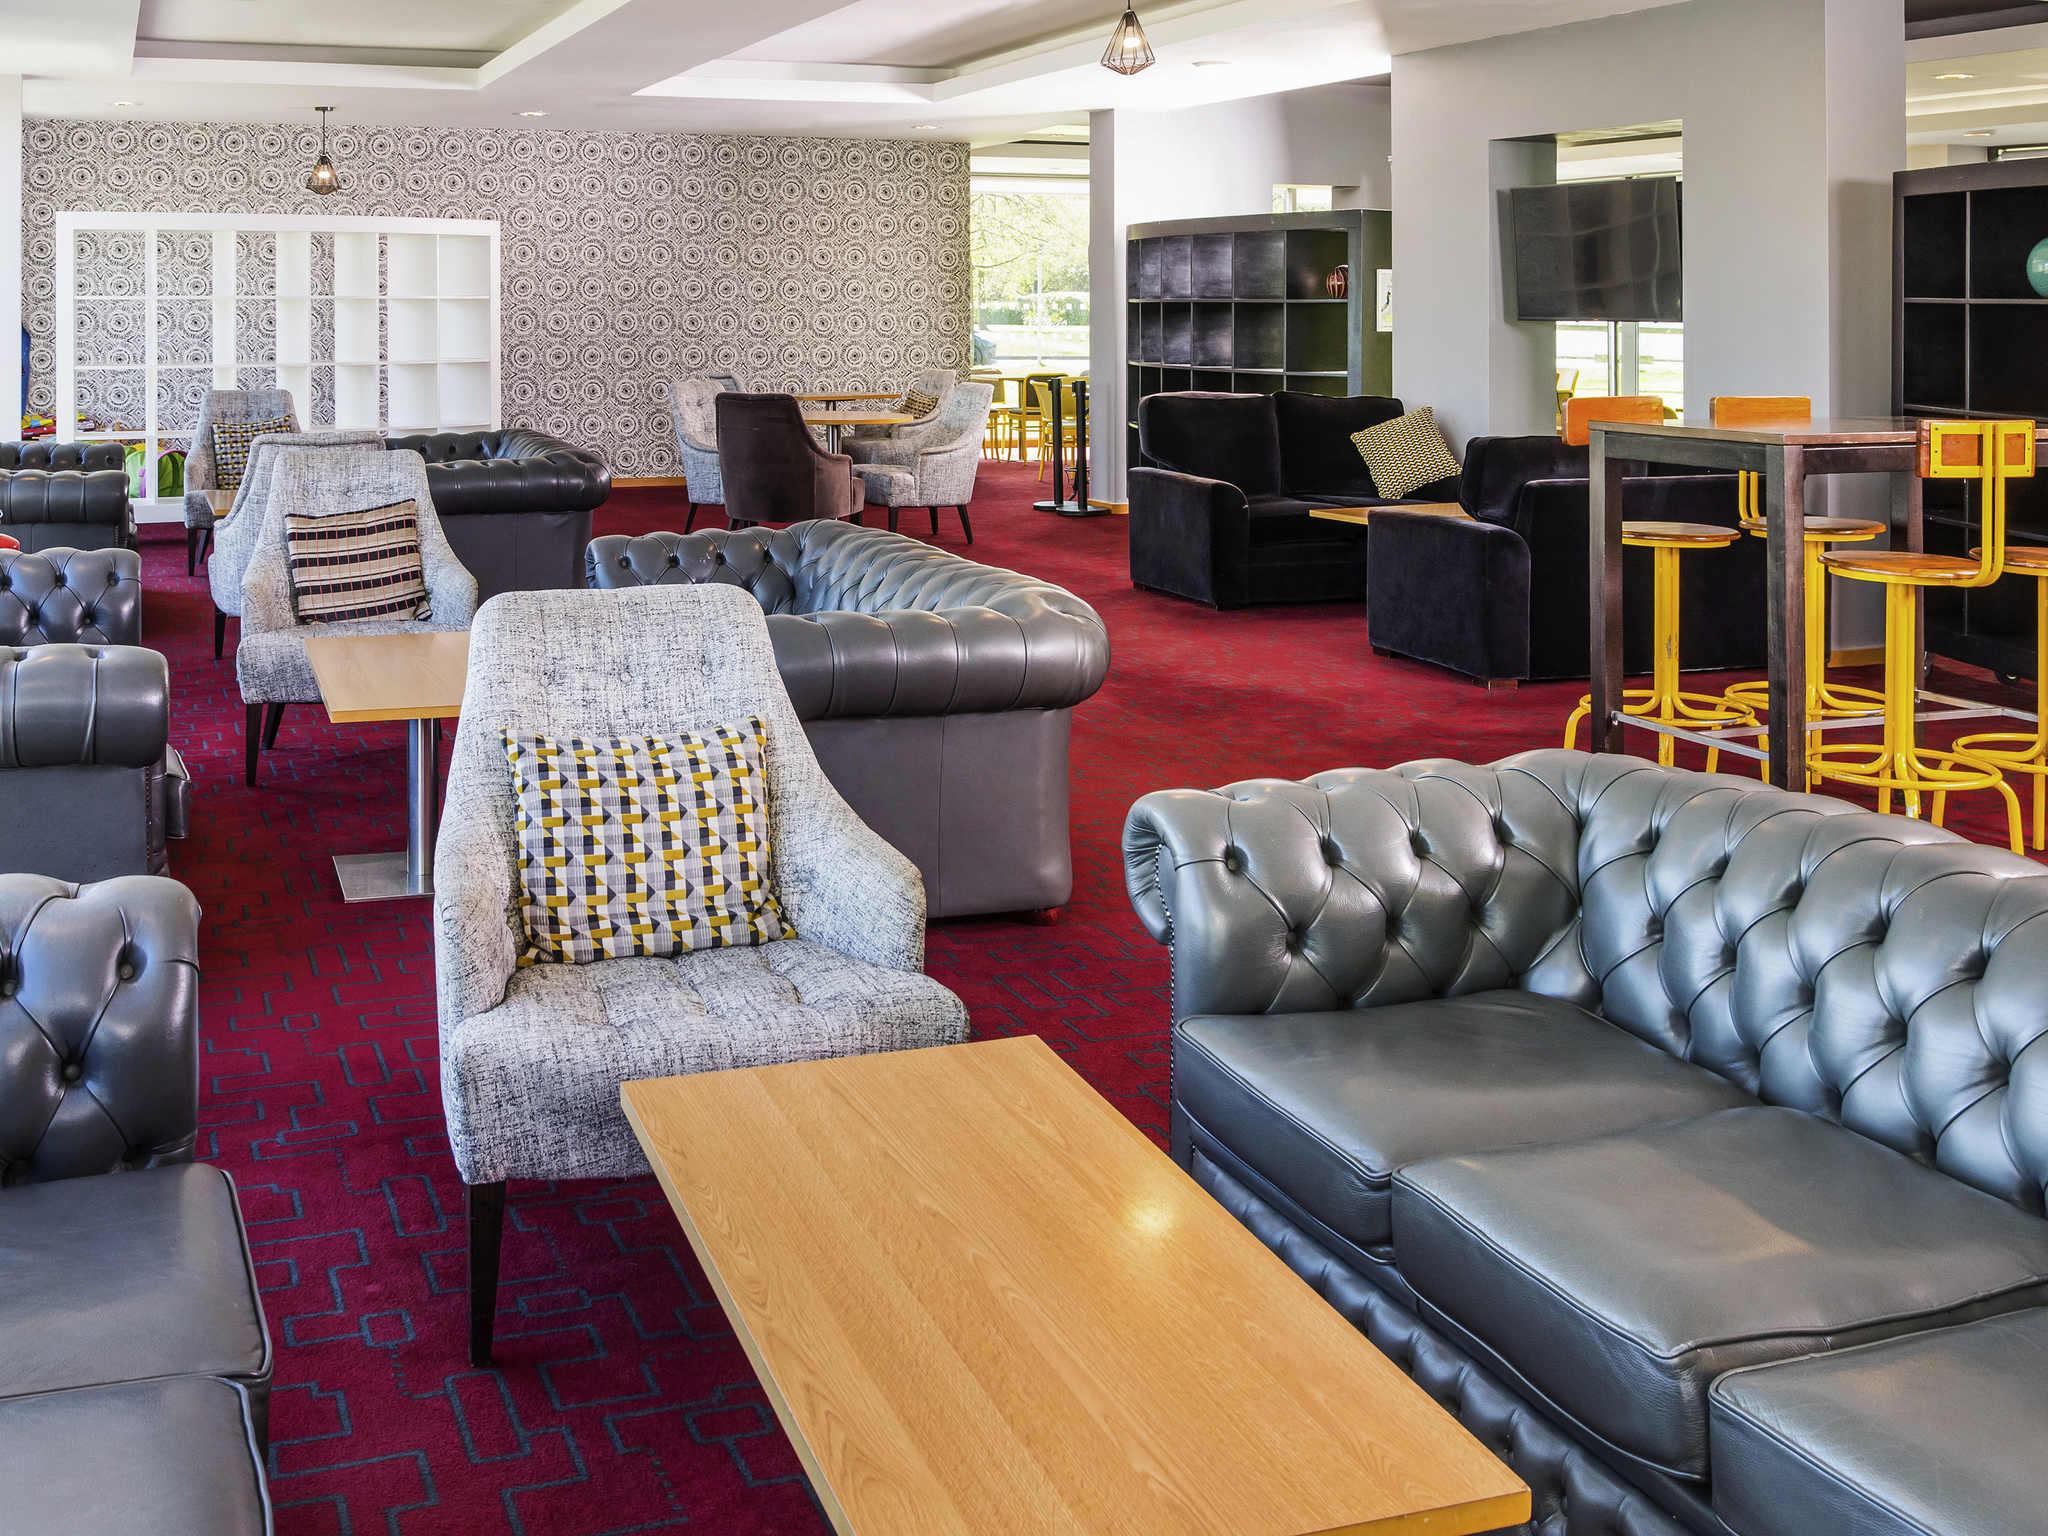 massachusetts discounts college bentley waltham near xxl see house hotel restaurant ma hyatt hotels